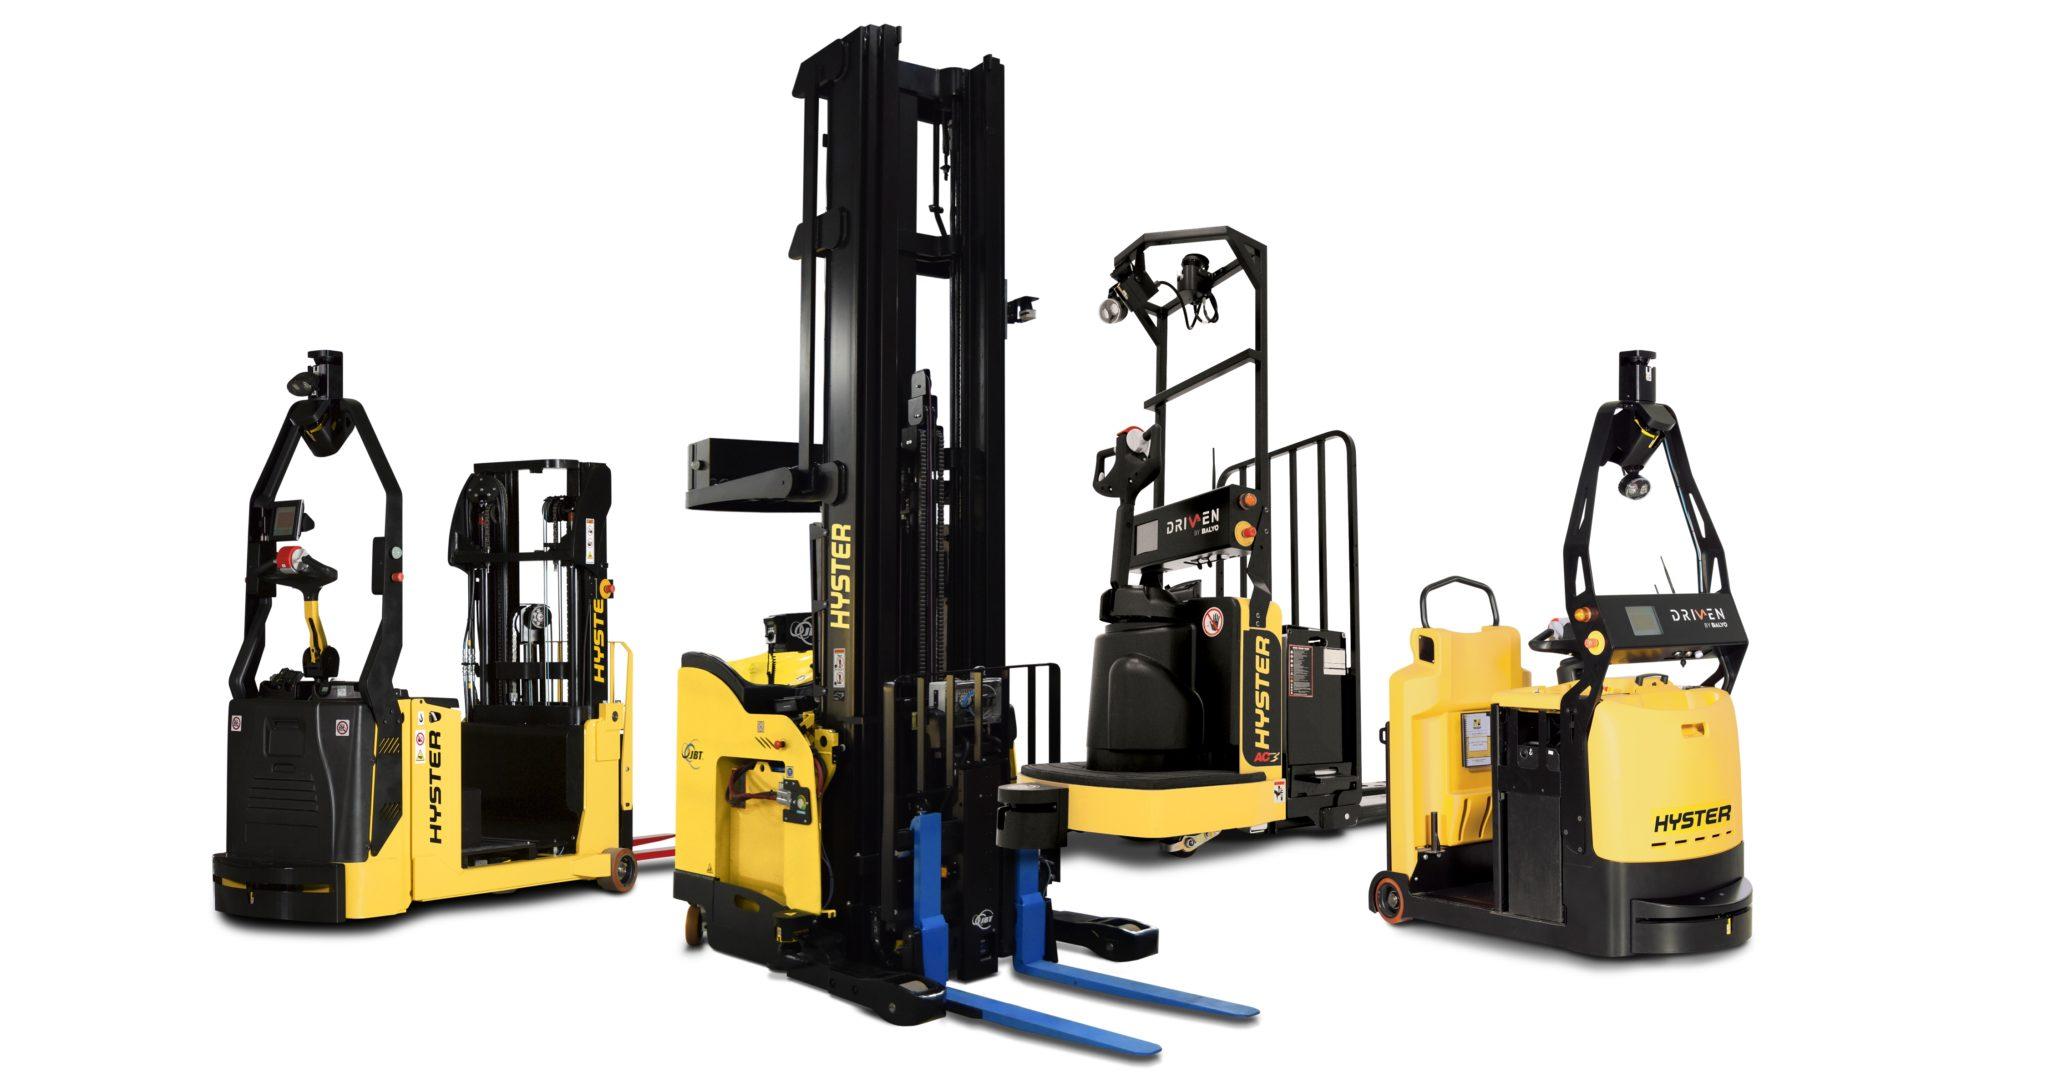 Hyster Robotic Forklifts